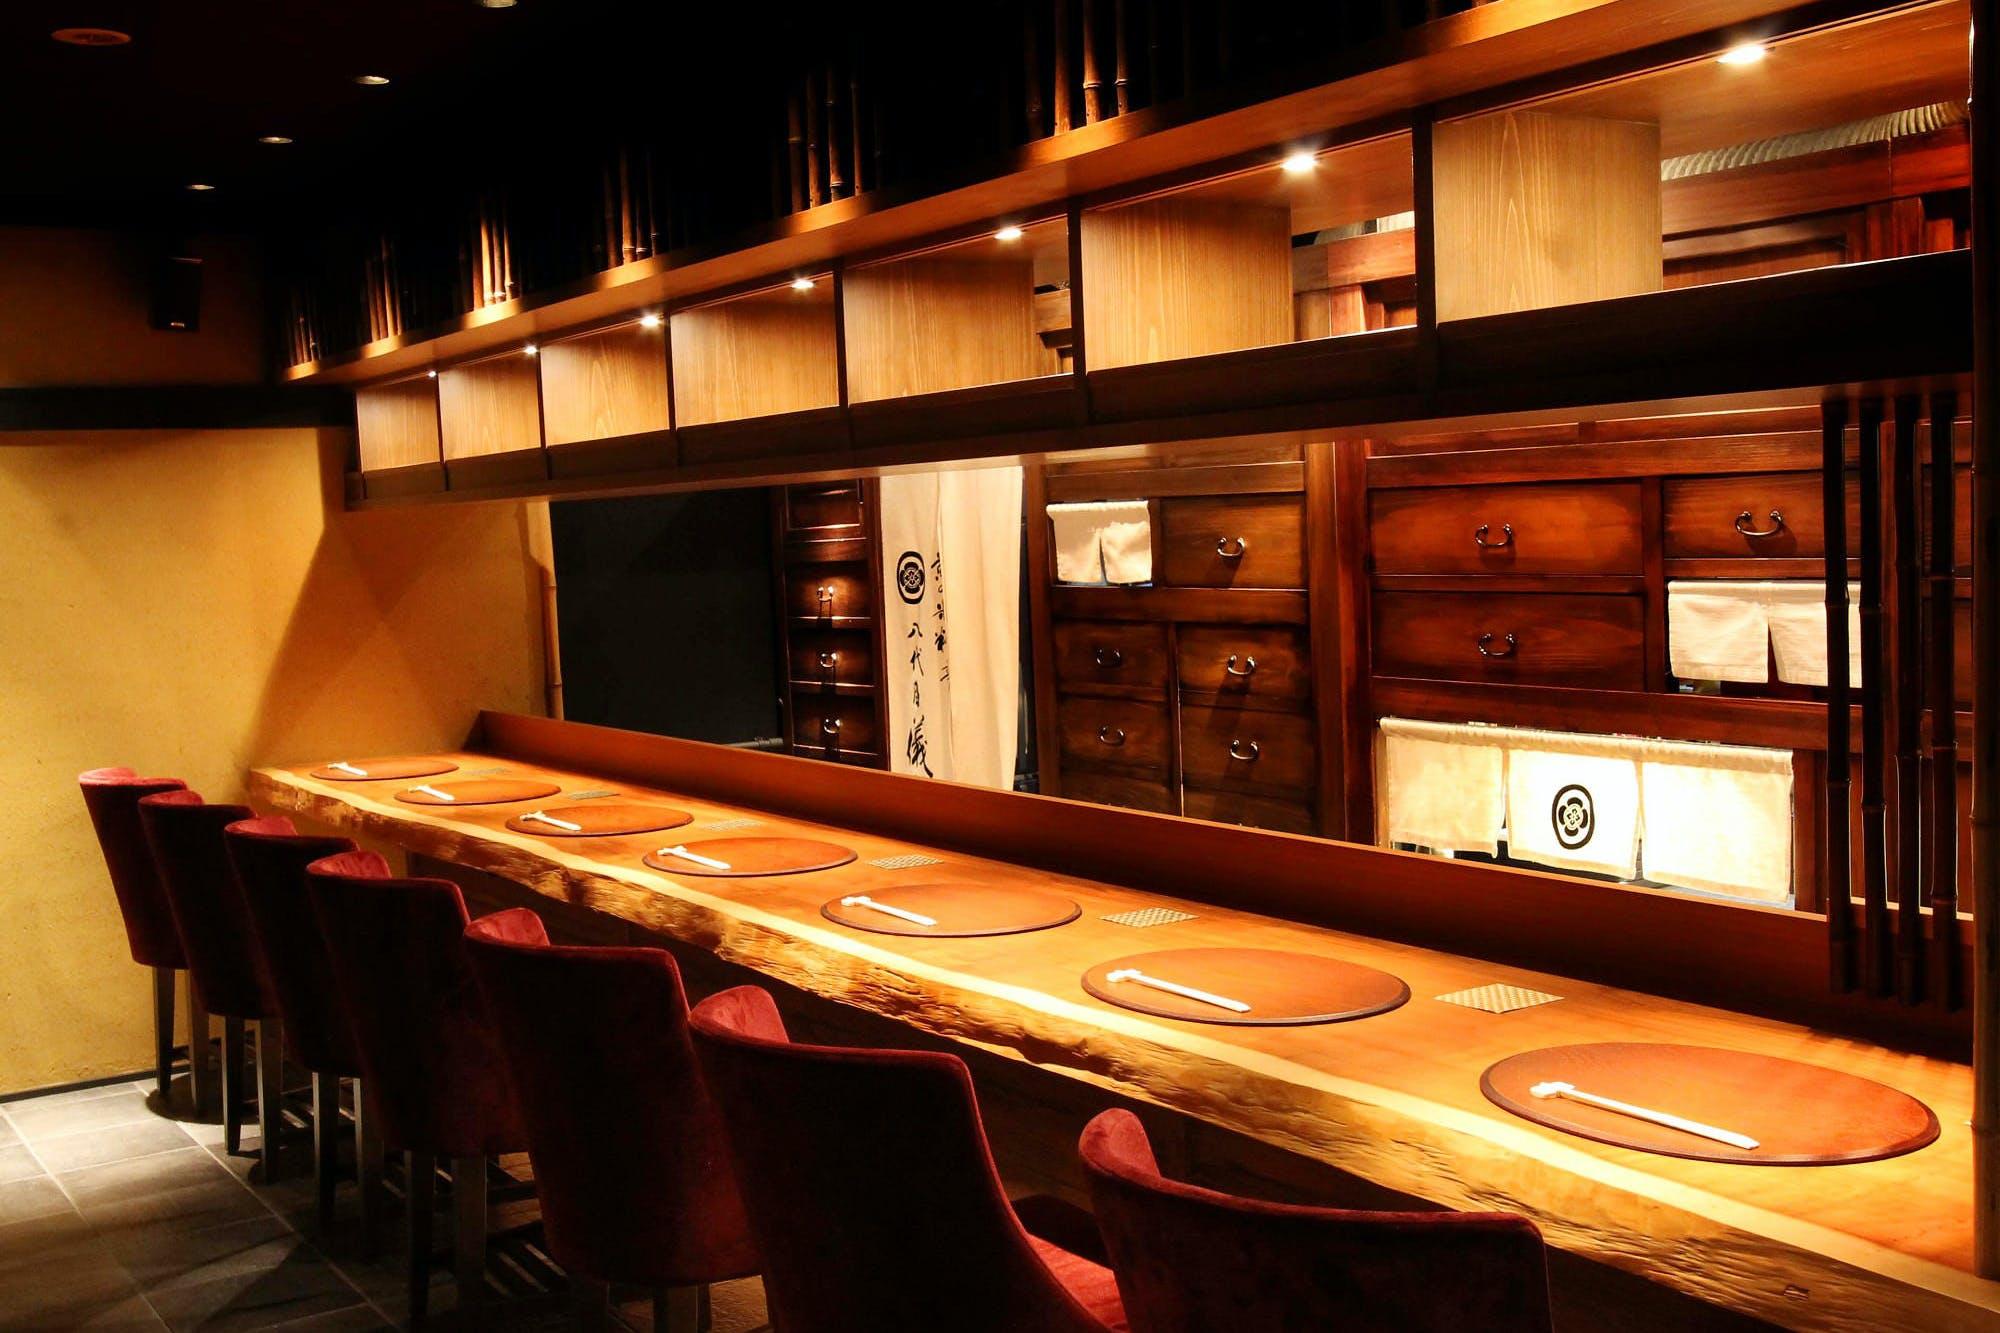 京の米料亭 八代目儀兵衛 祇園本店